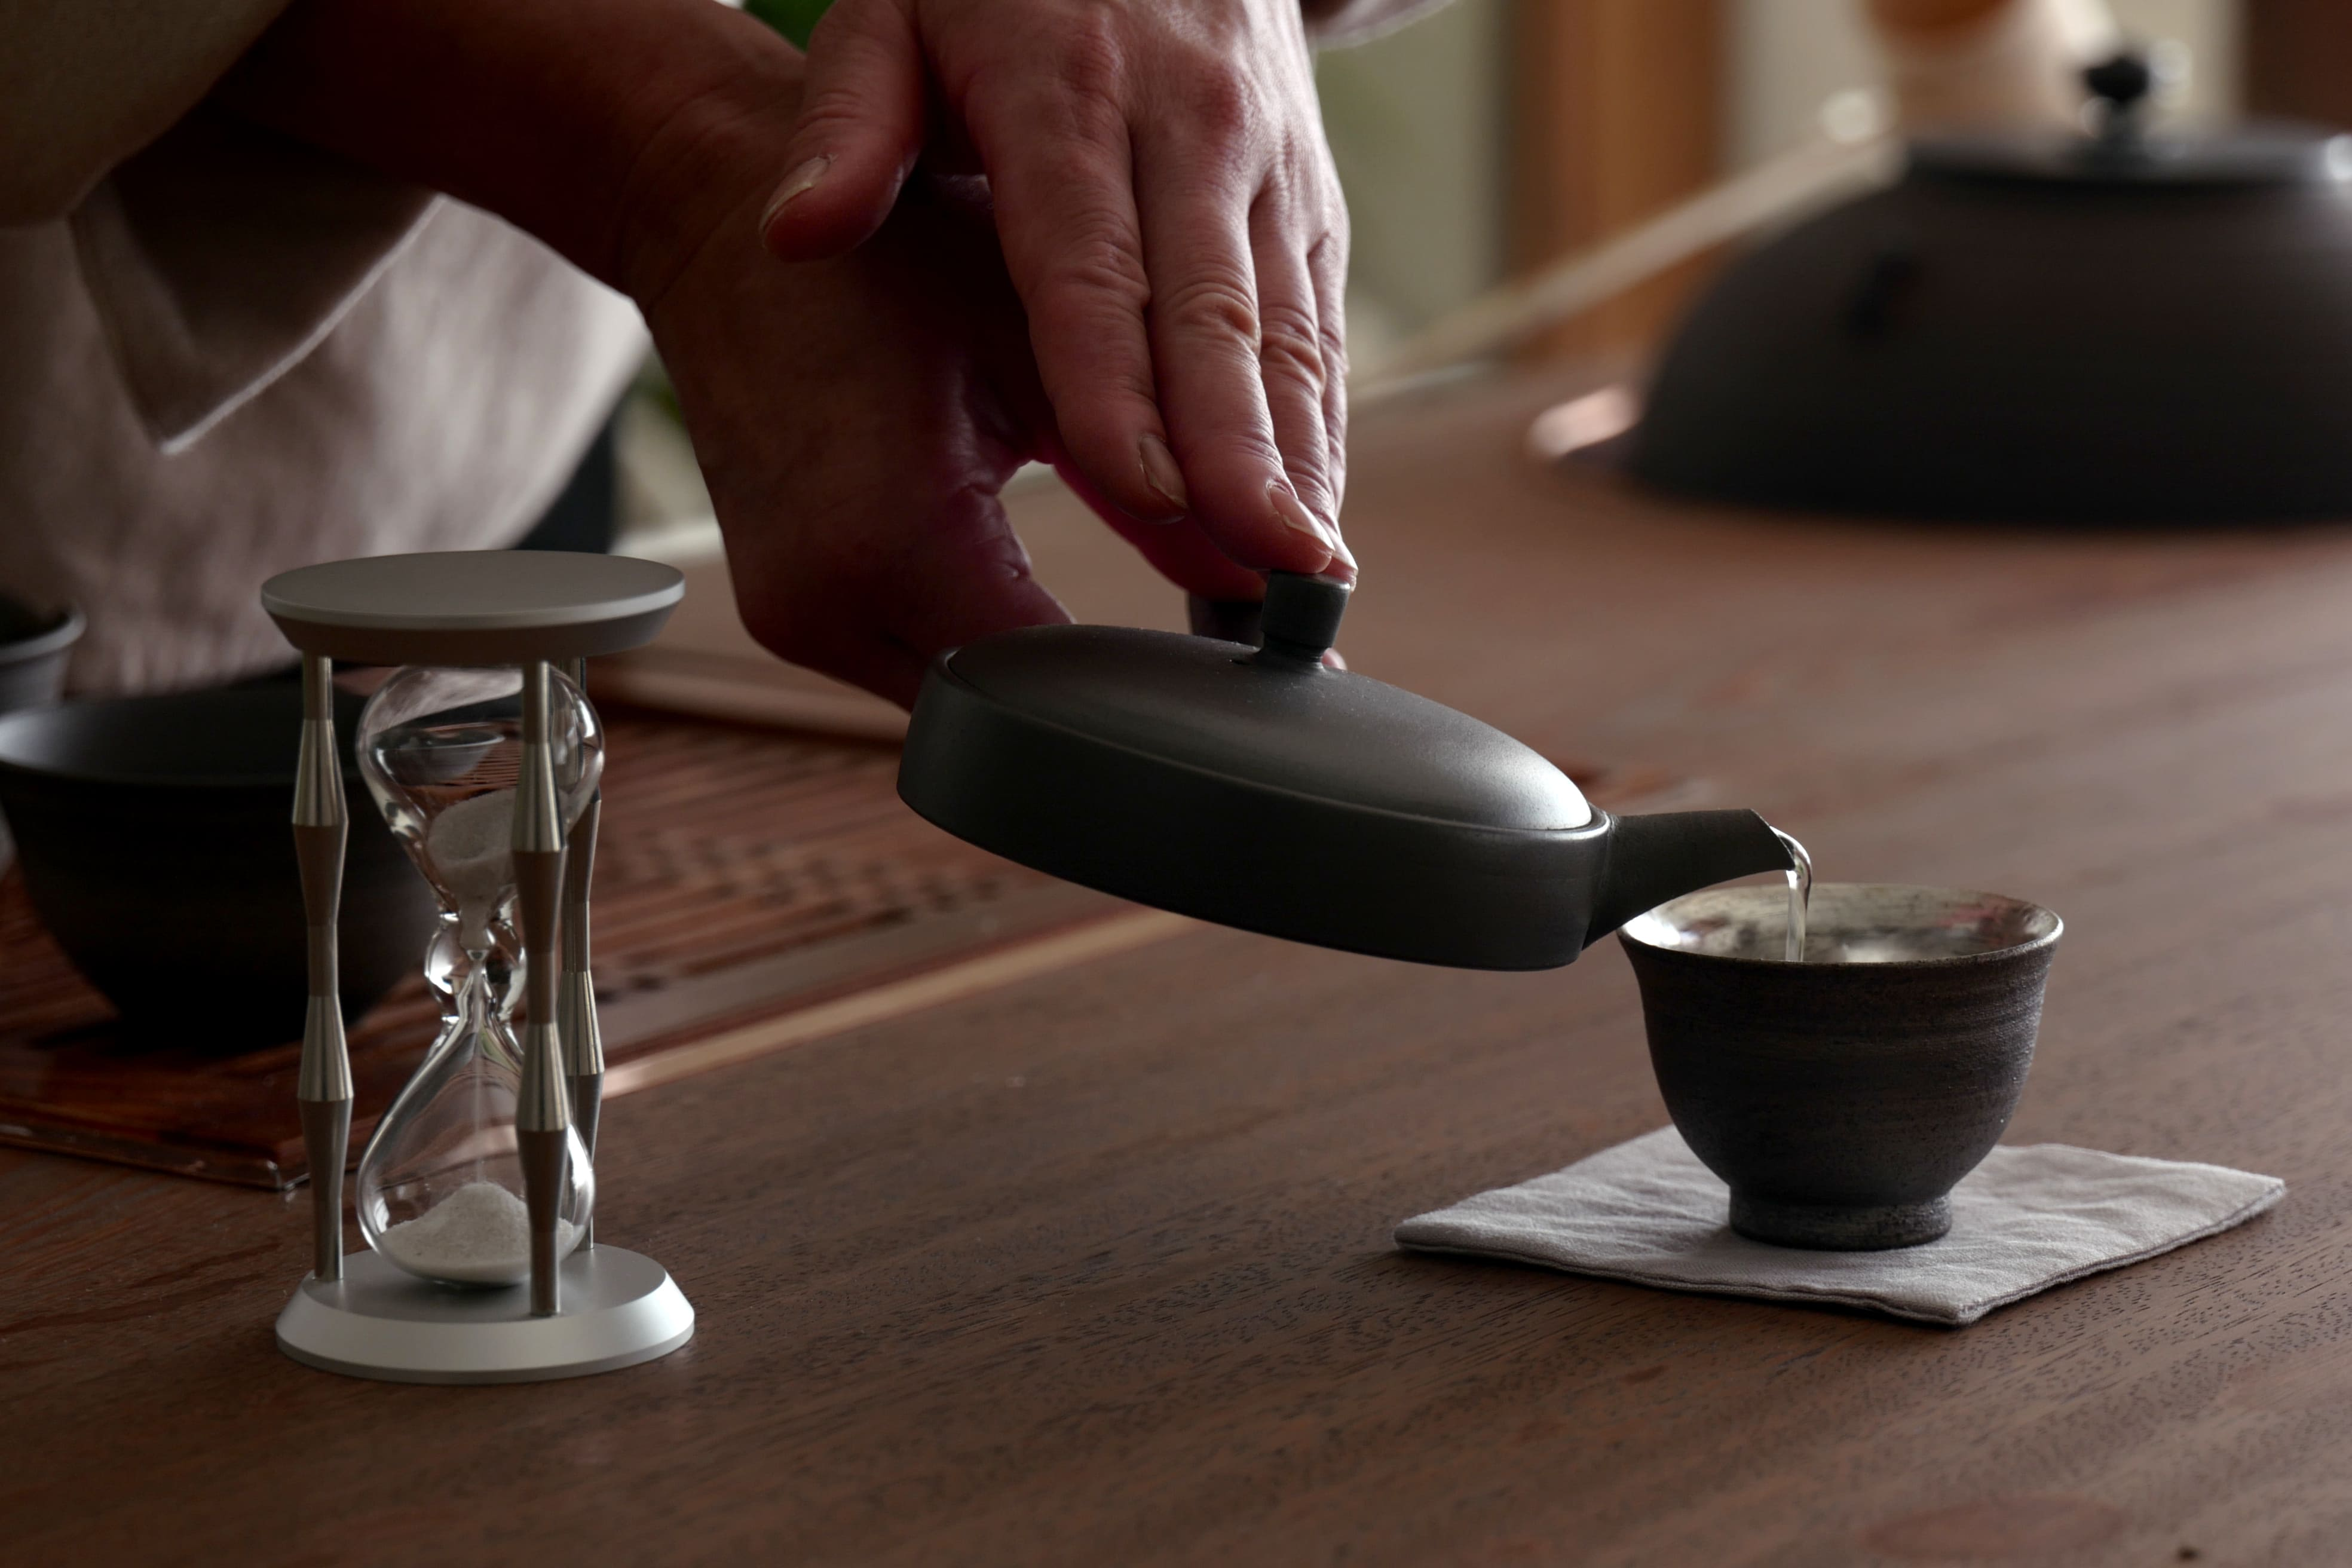 sarasaが大和茶を選ぶ理由/大和茶の歴史